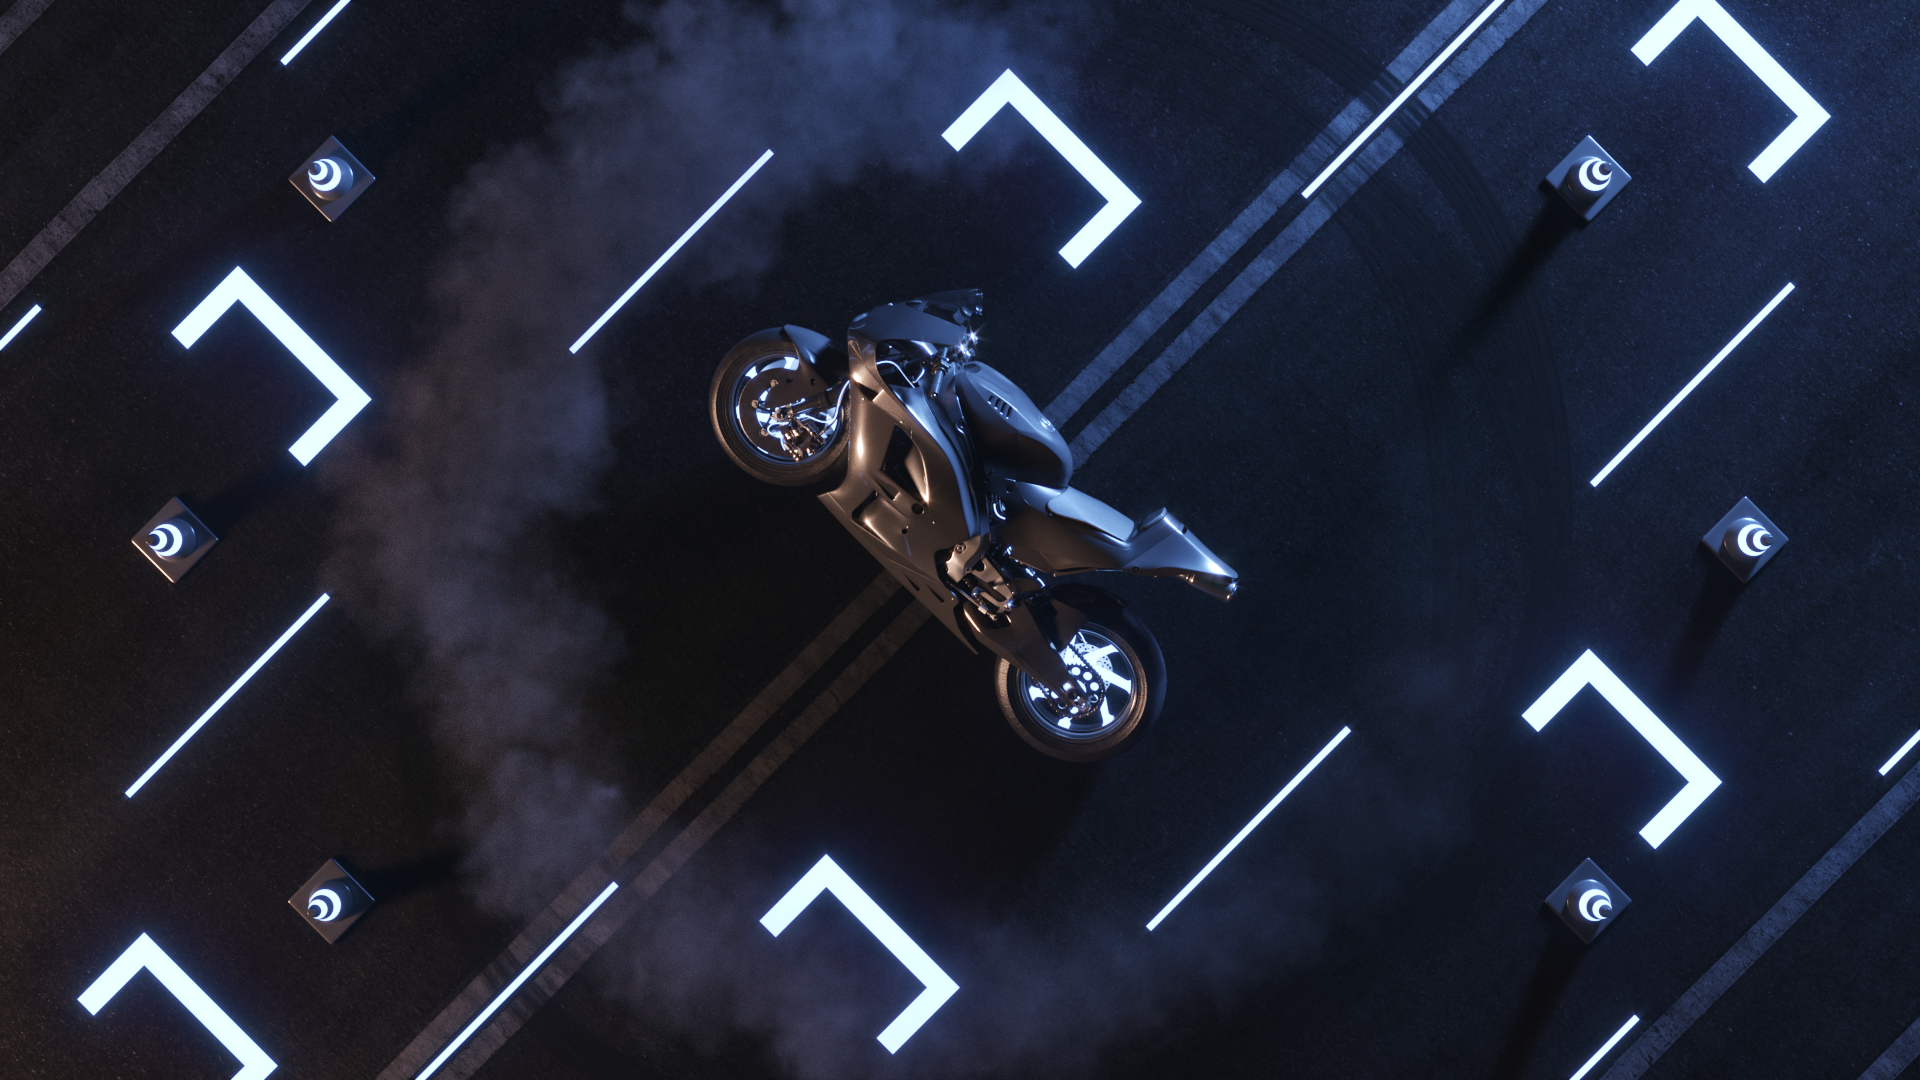 MotoGP - Style frame 01